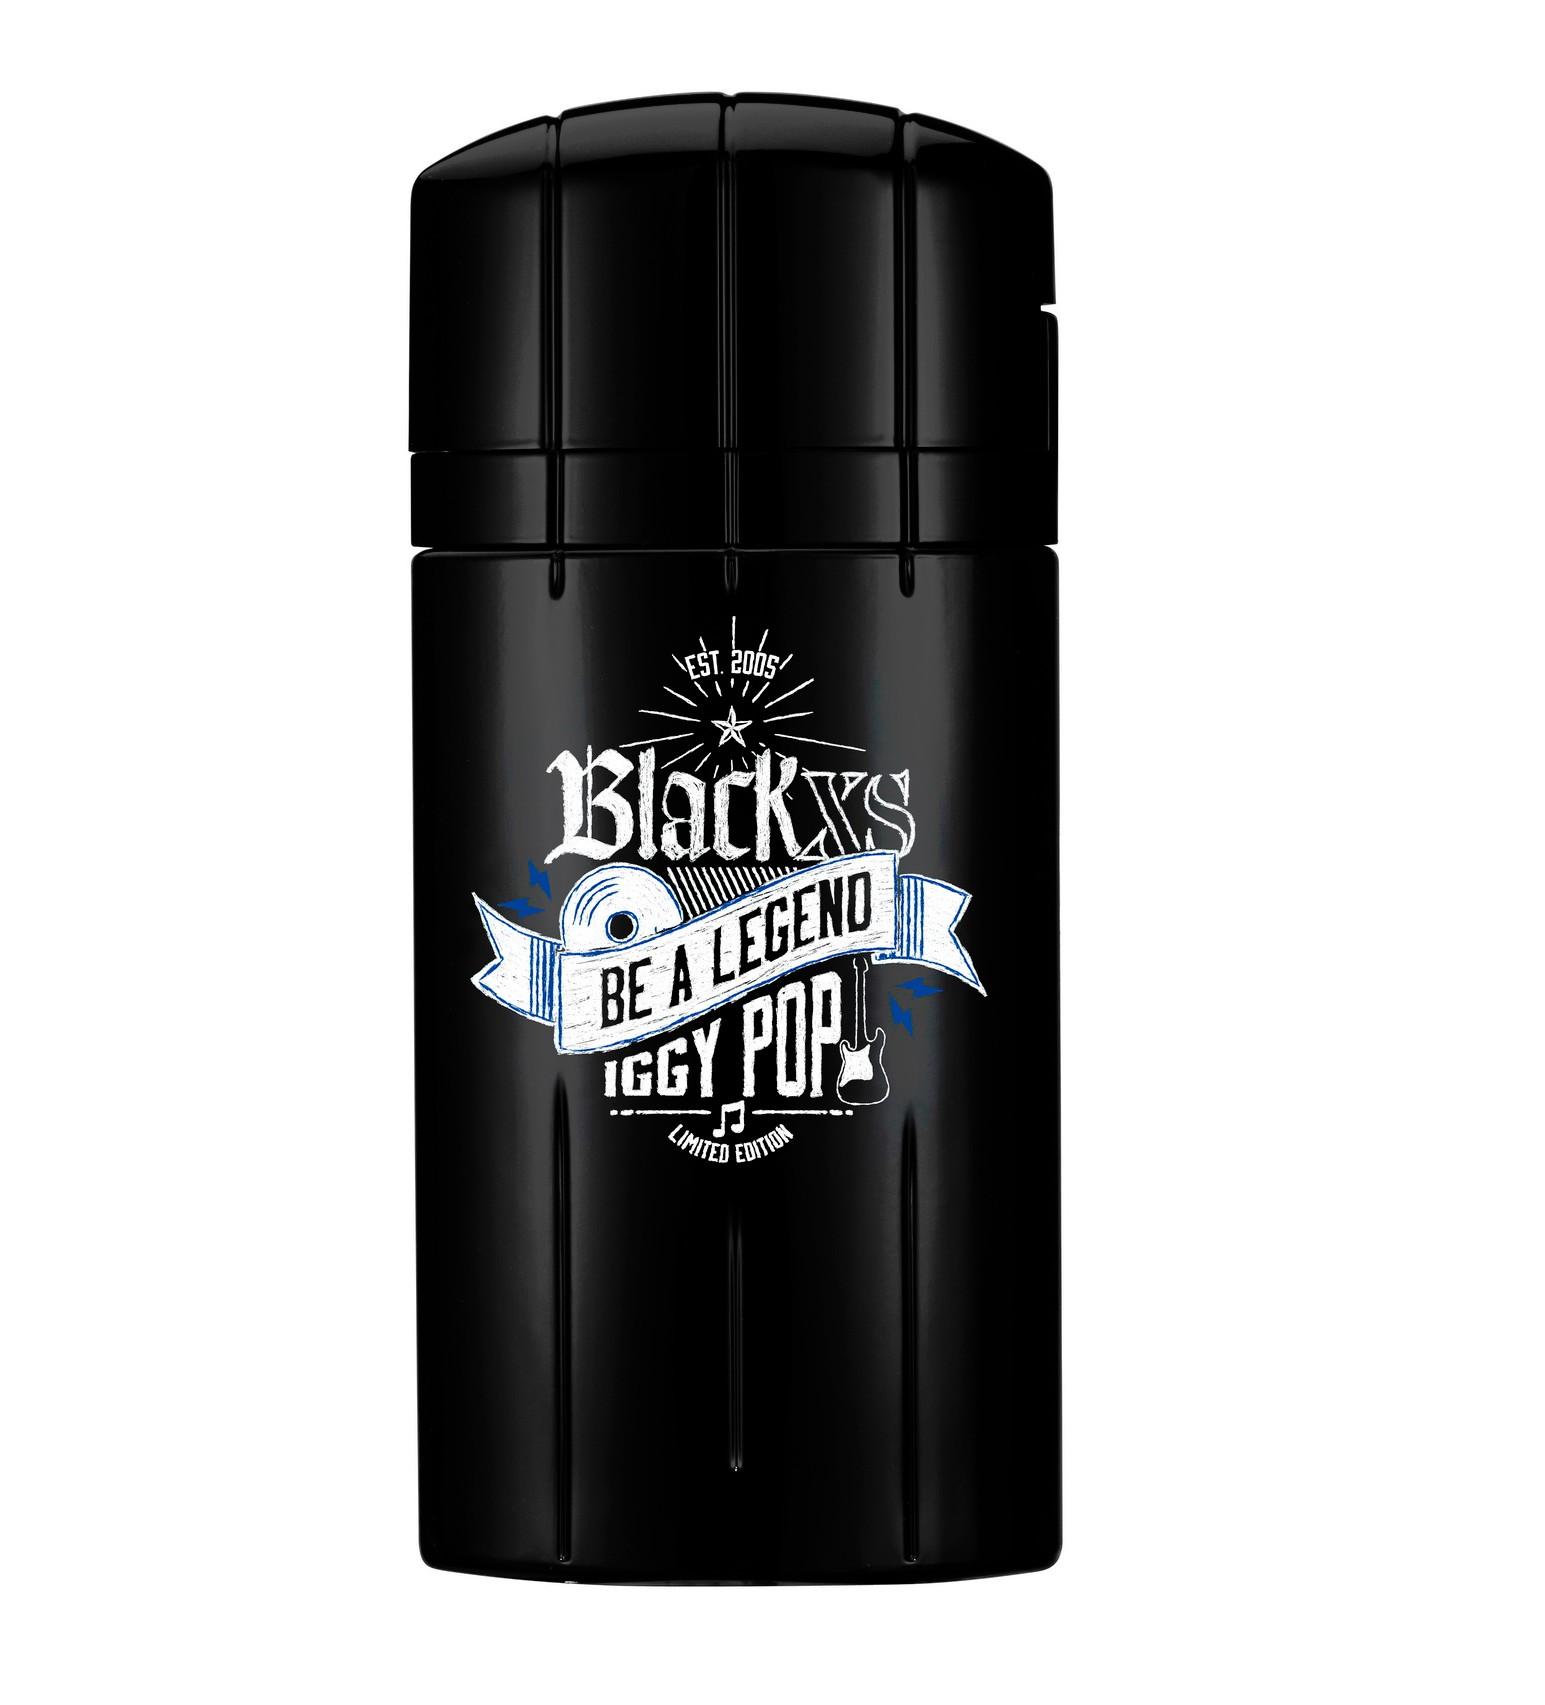 Paco Rabanne Black XS Be a Legend Iggy Pop аромат для мужчин